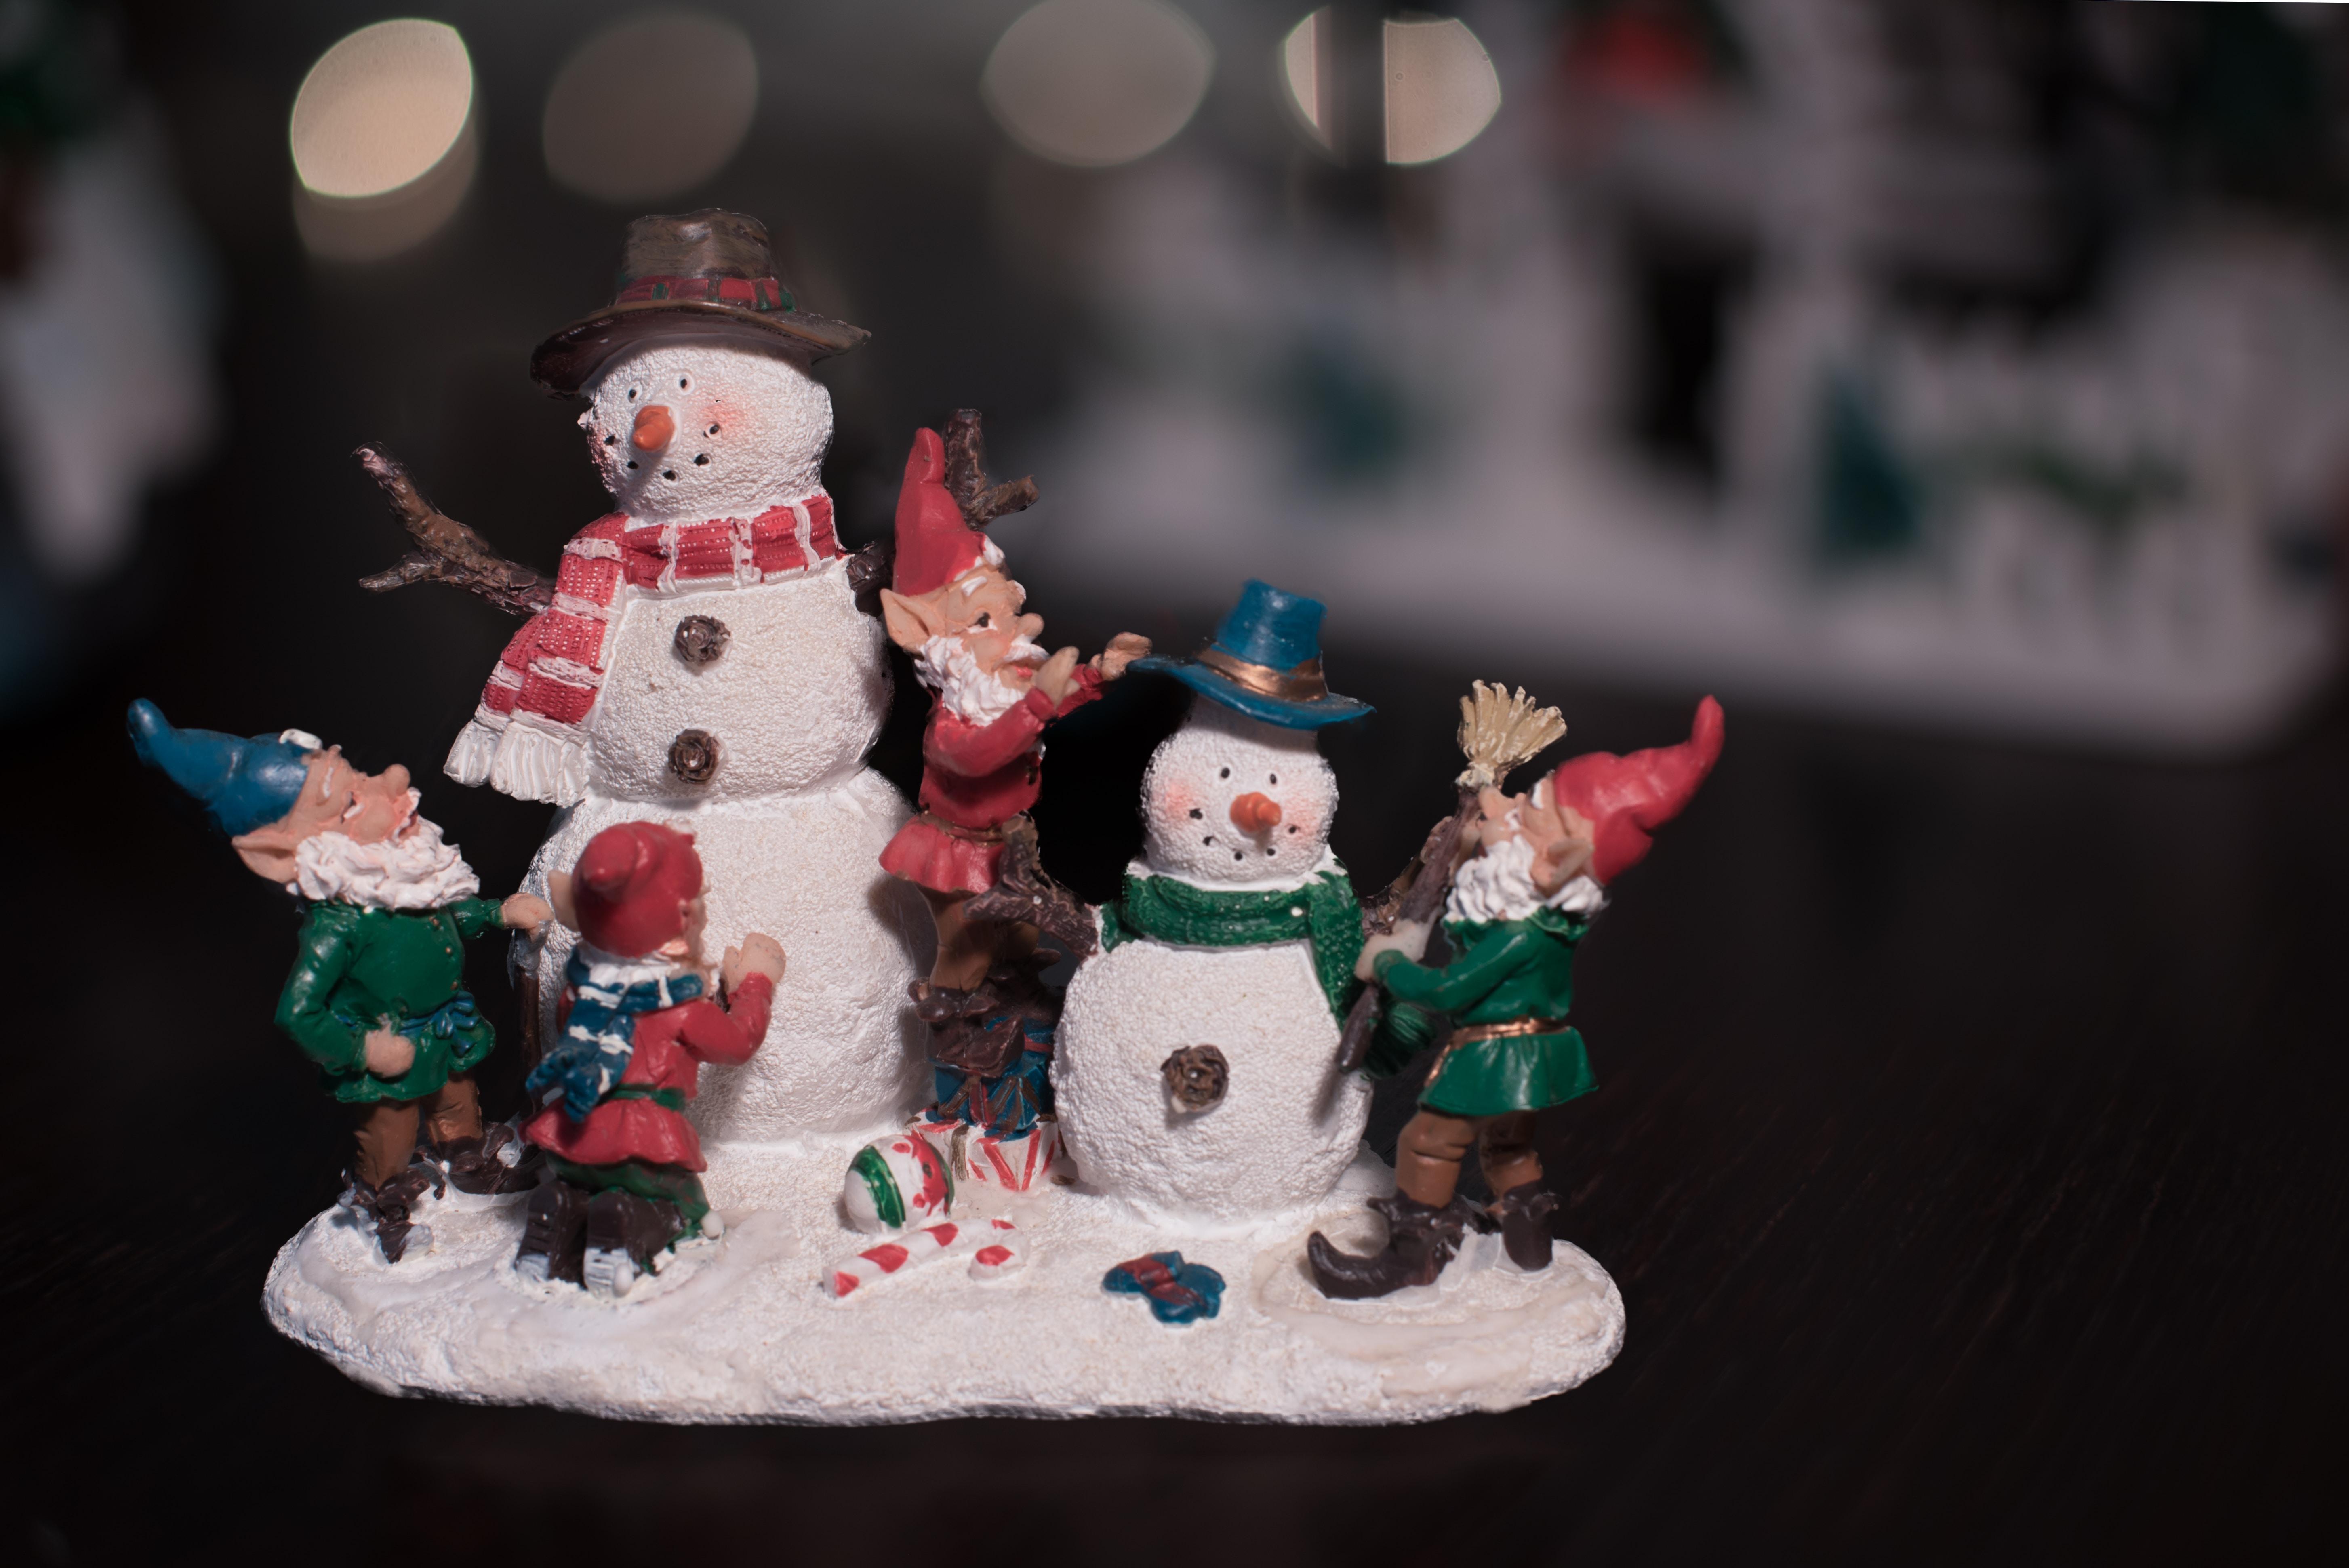 A snowman and gnomes XMAS ornament.